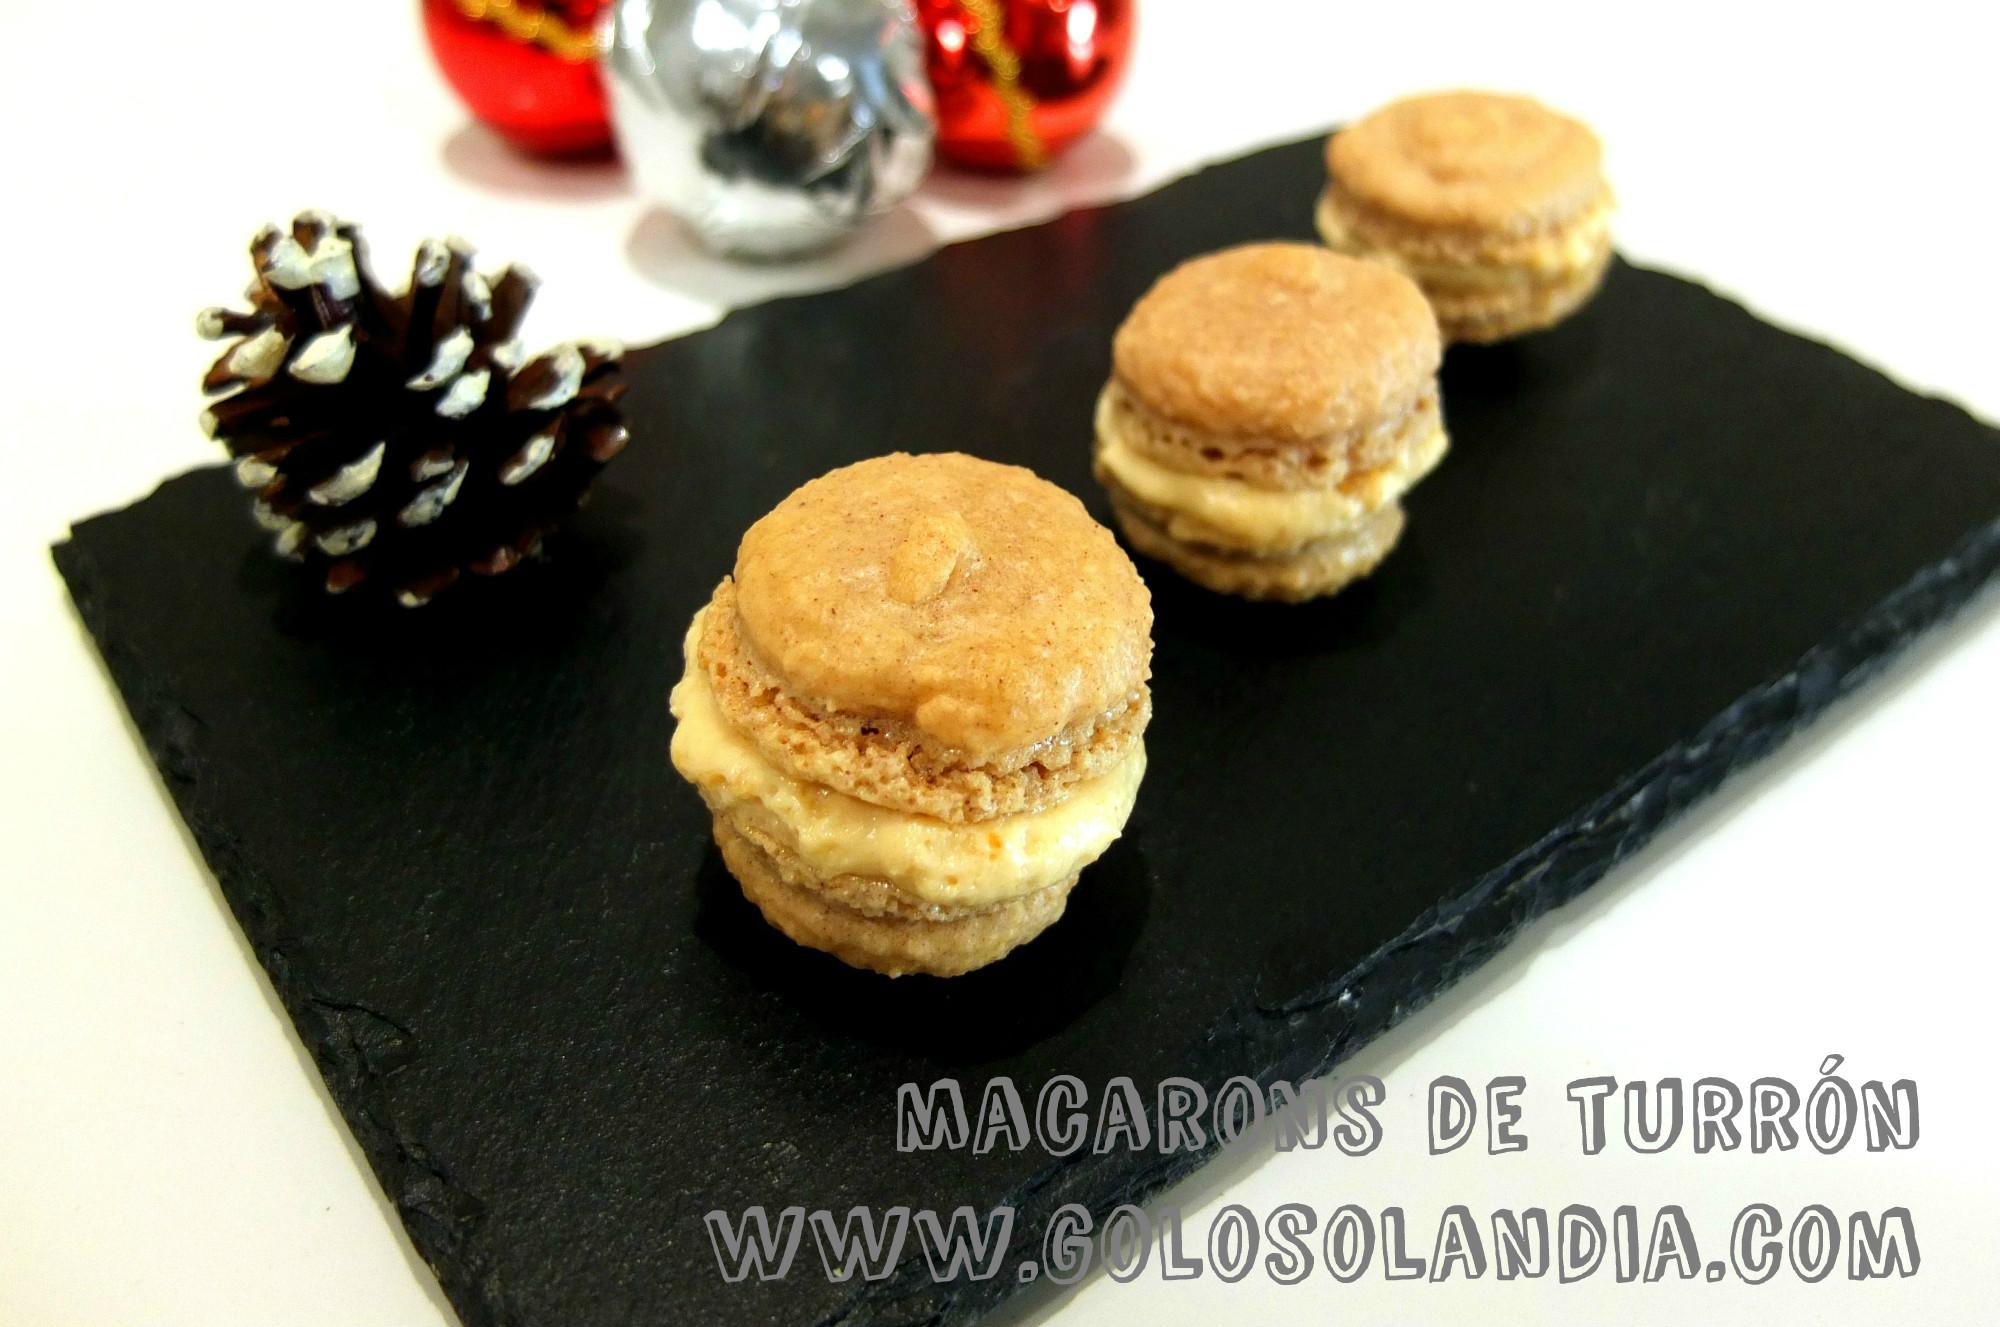 macarons de turron